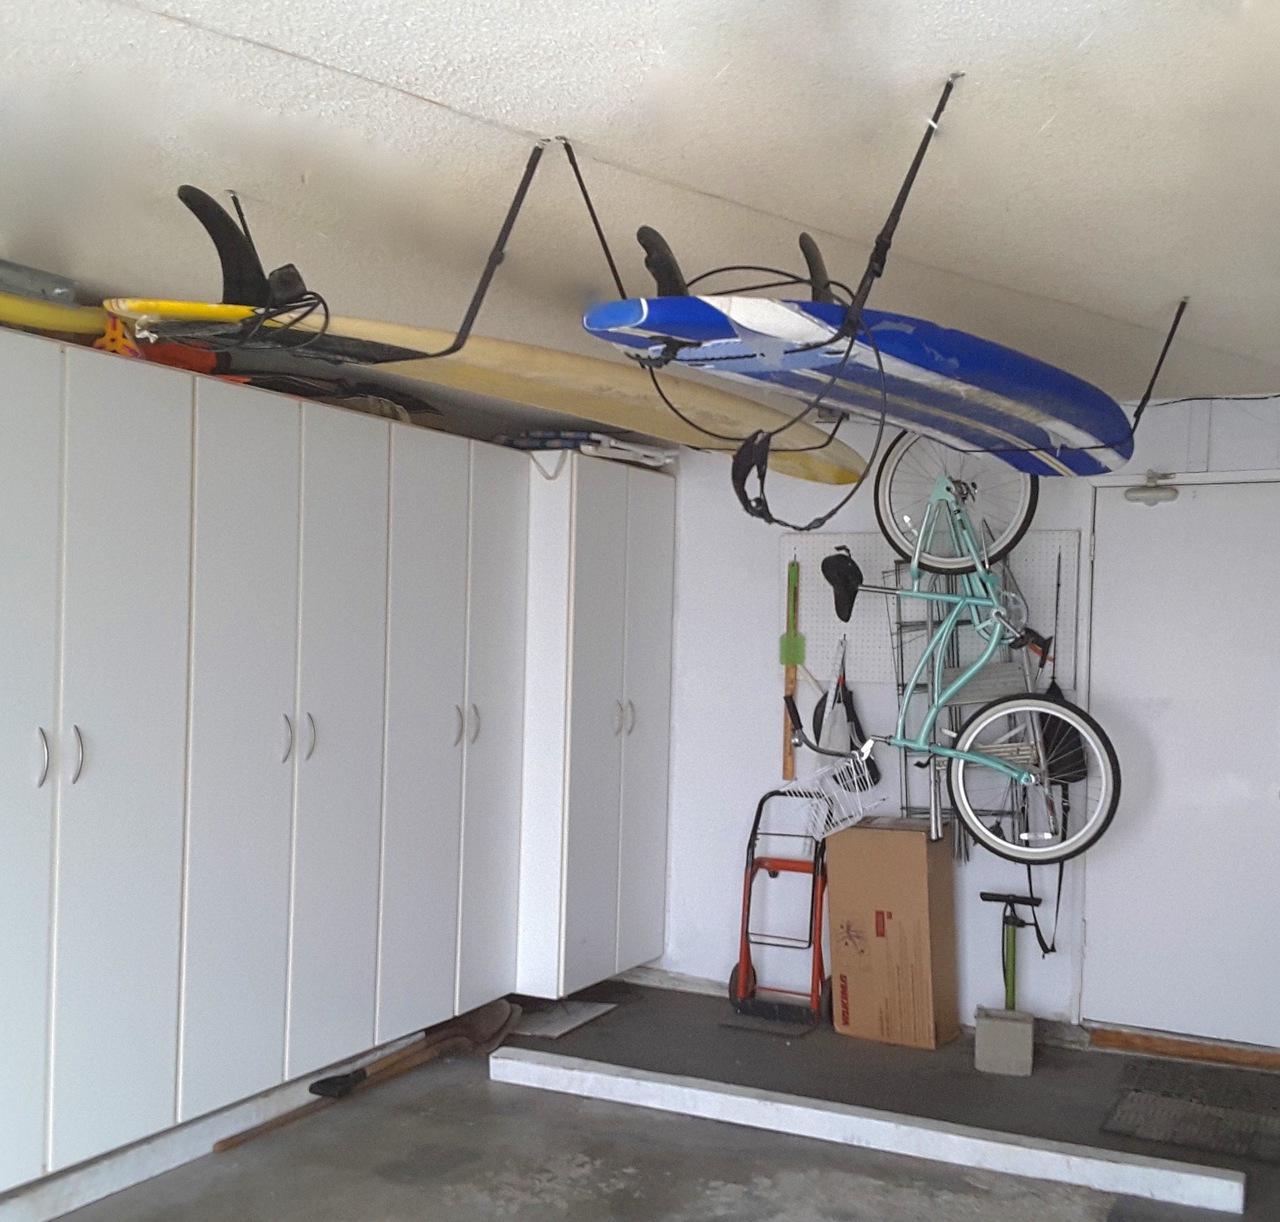 Exceptional Garage Ceiling Surfboard Strap Rack